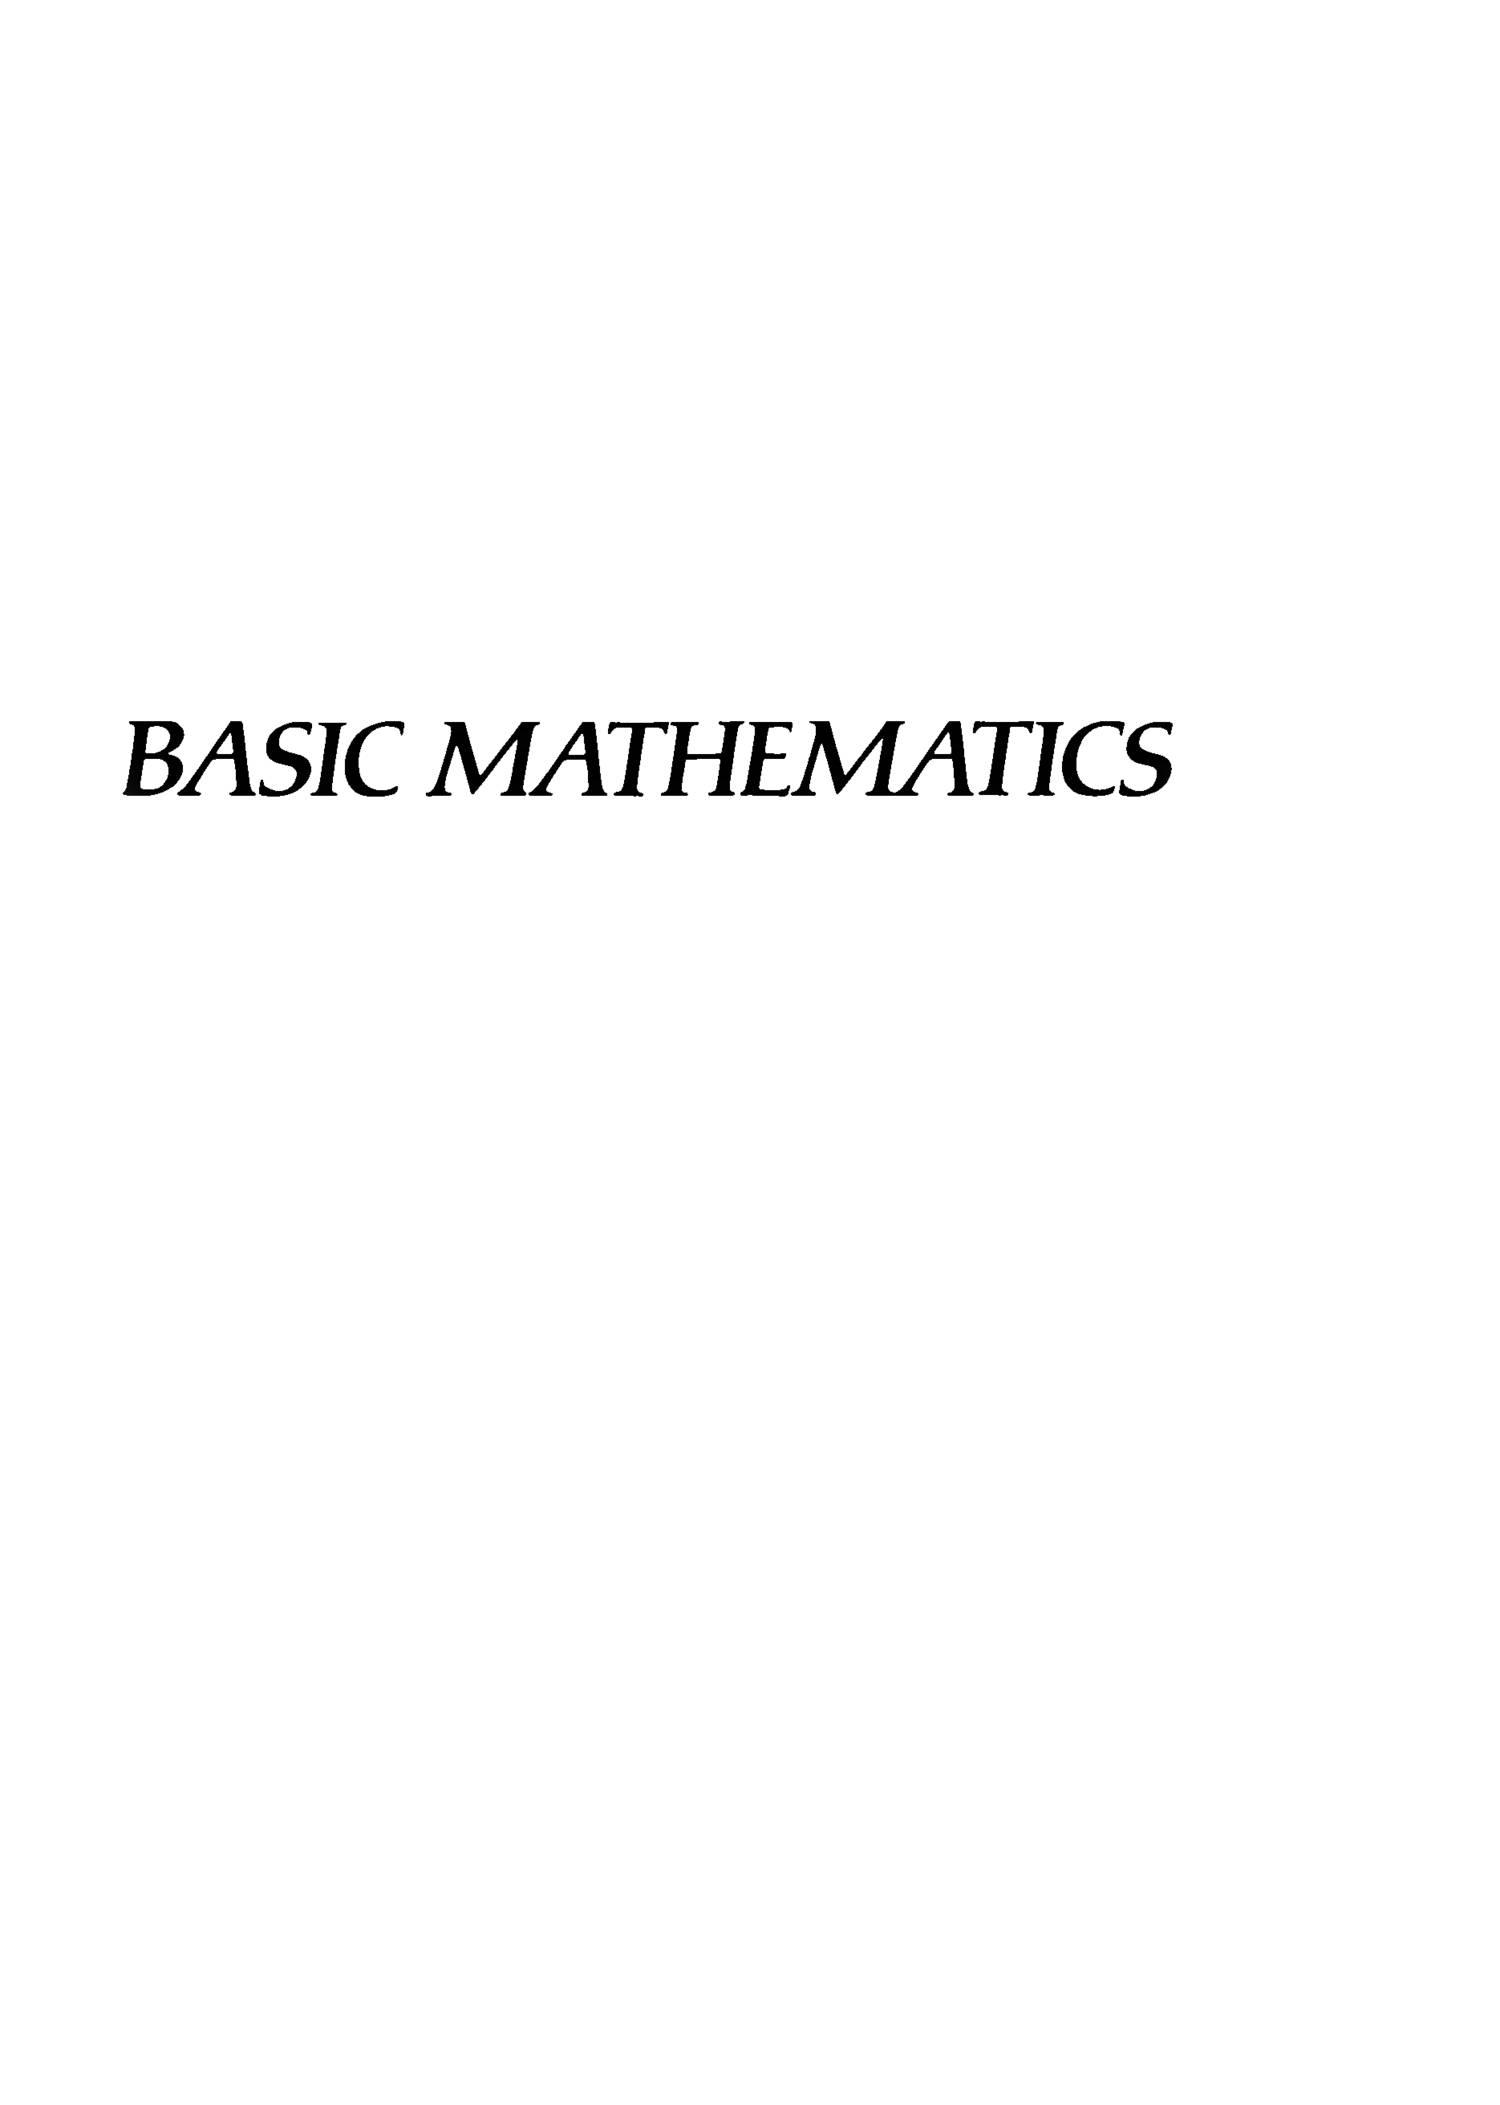 Basic Mathematics: Lang, Serge: 9780387967875: Amazon.com ...